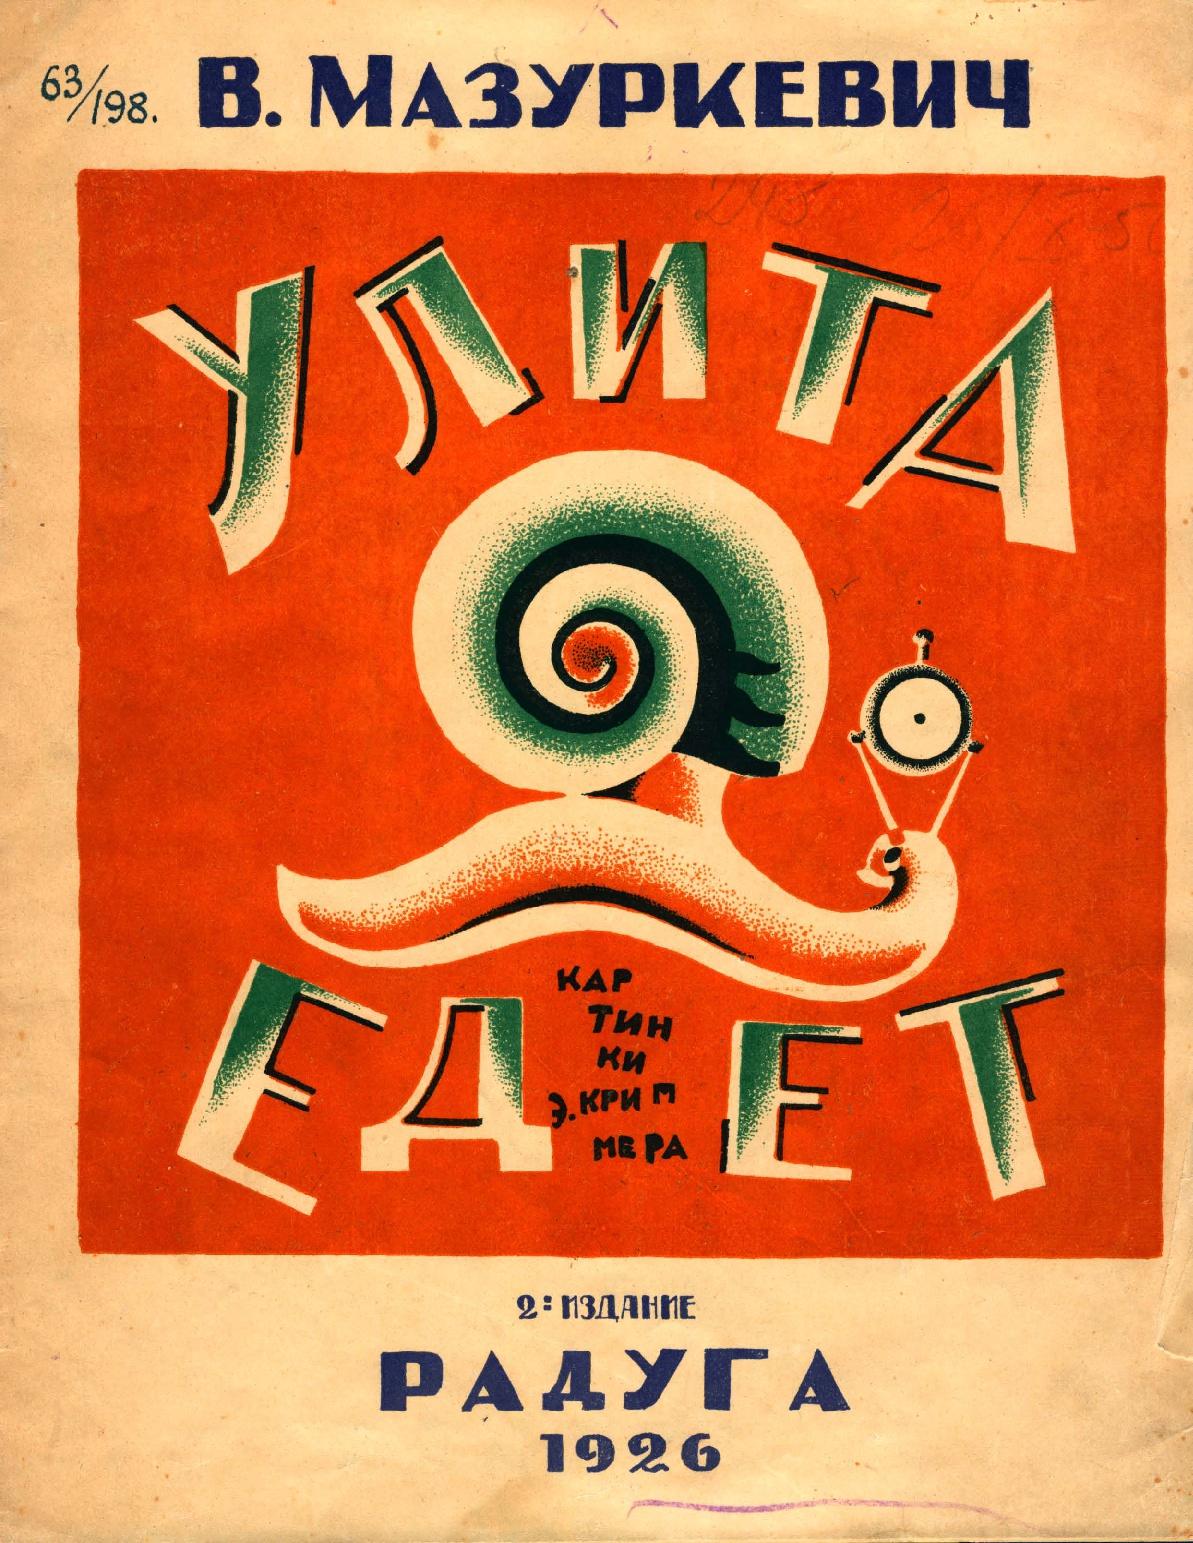 Мазуркевич В.А. Улита едет : [Стихи для детей] / В. Мазуркевич ; Картинки Э. Криммера. - 2-е изд. - М. ; Л.: Радуга, 1926. - 13 с. : ил.